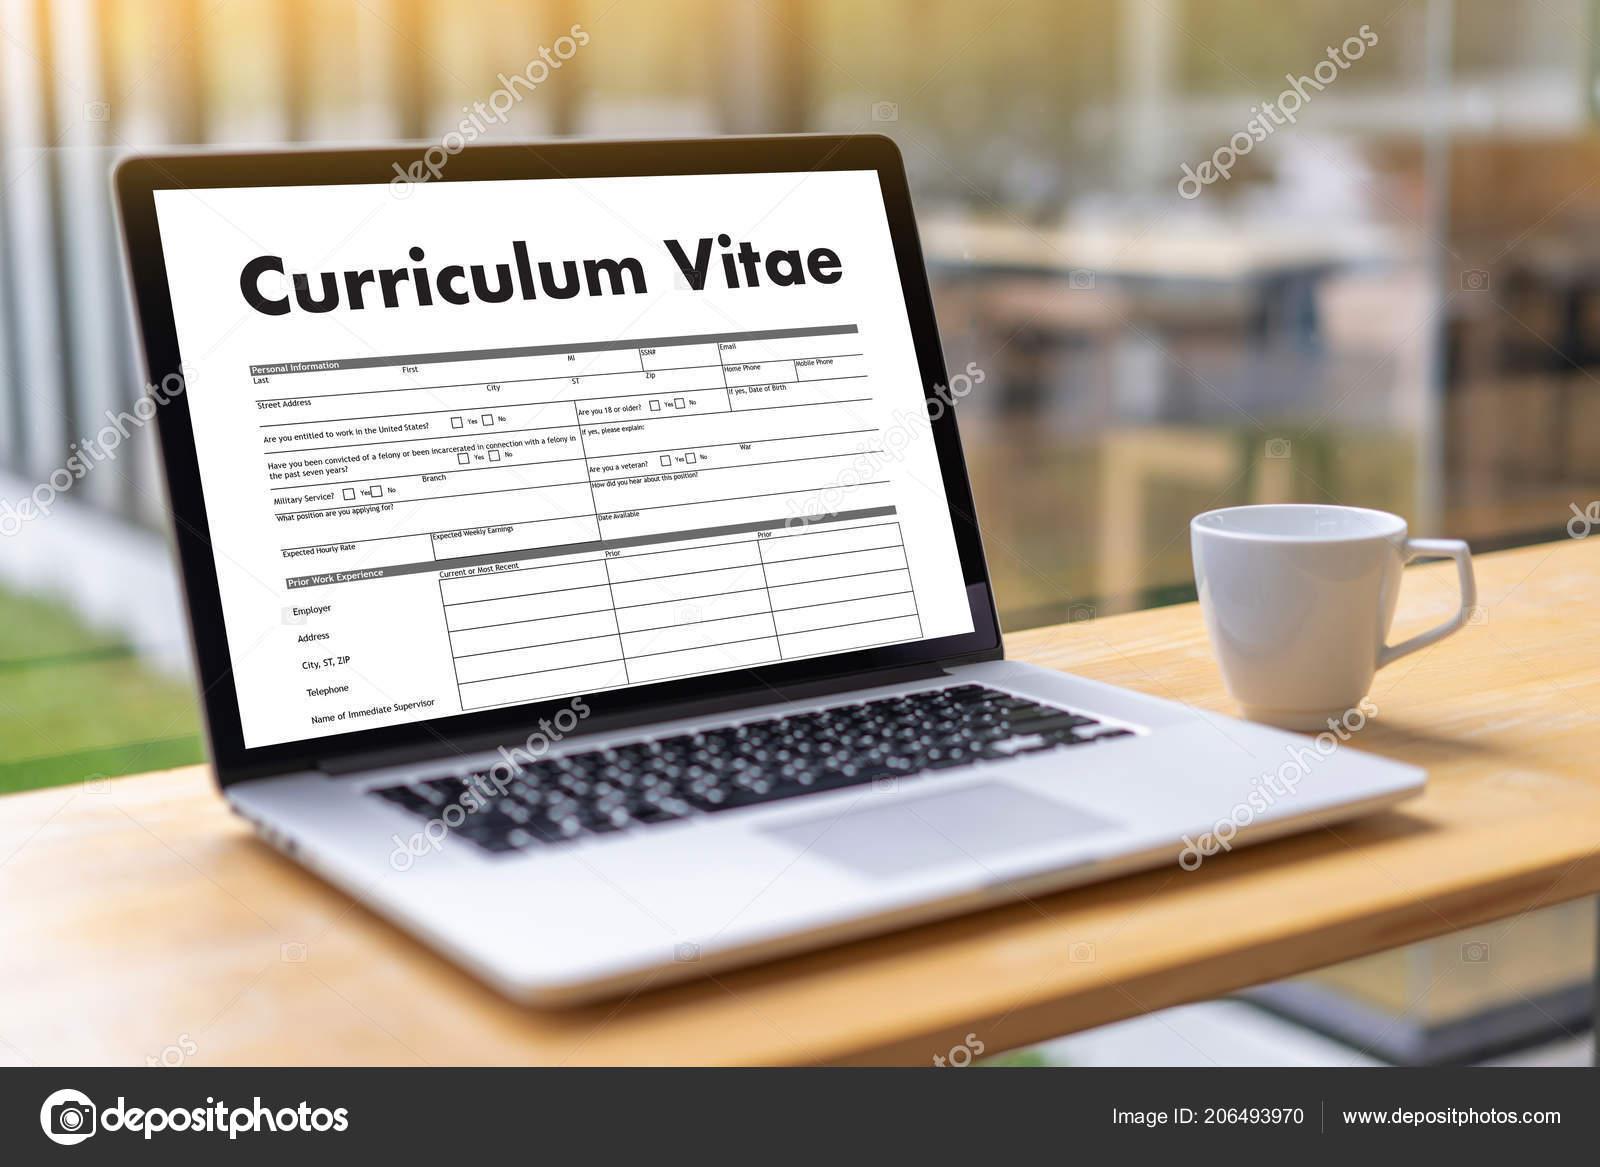 Curriculum Vitae Job Interview Concept Business Resume Business